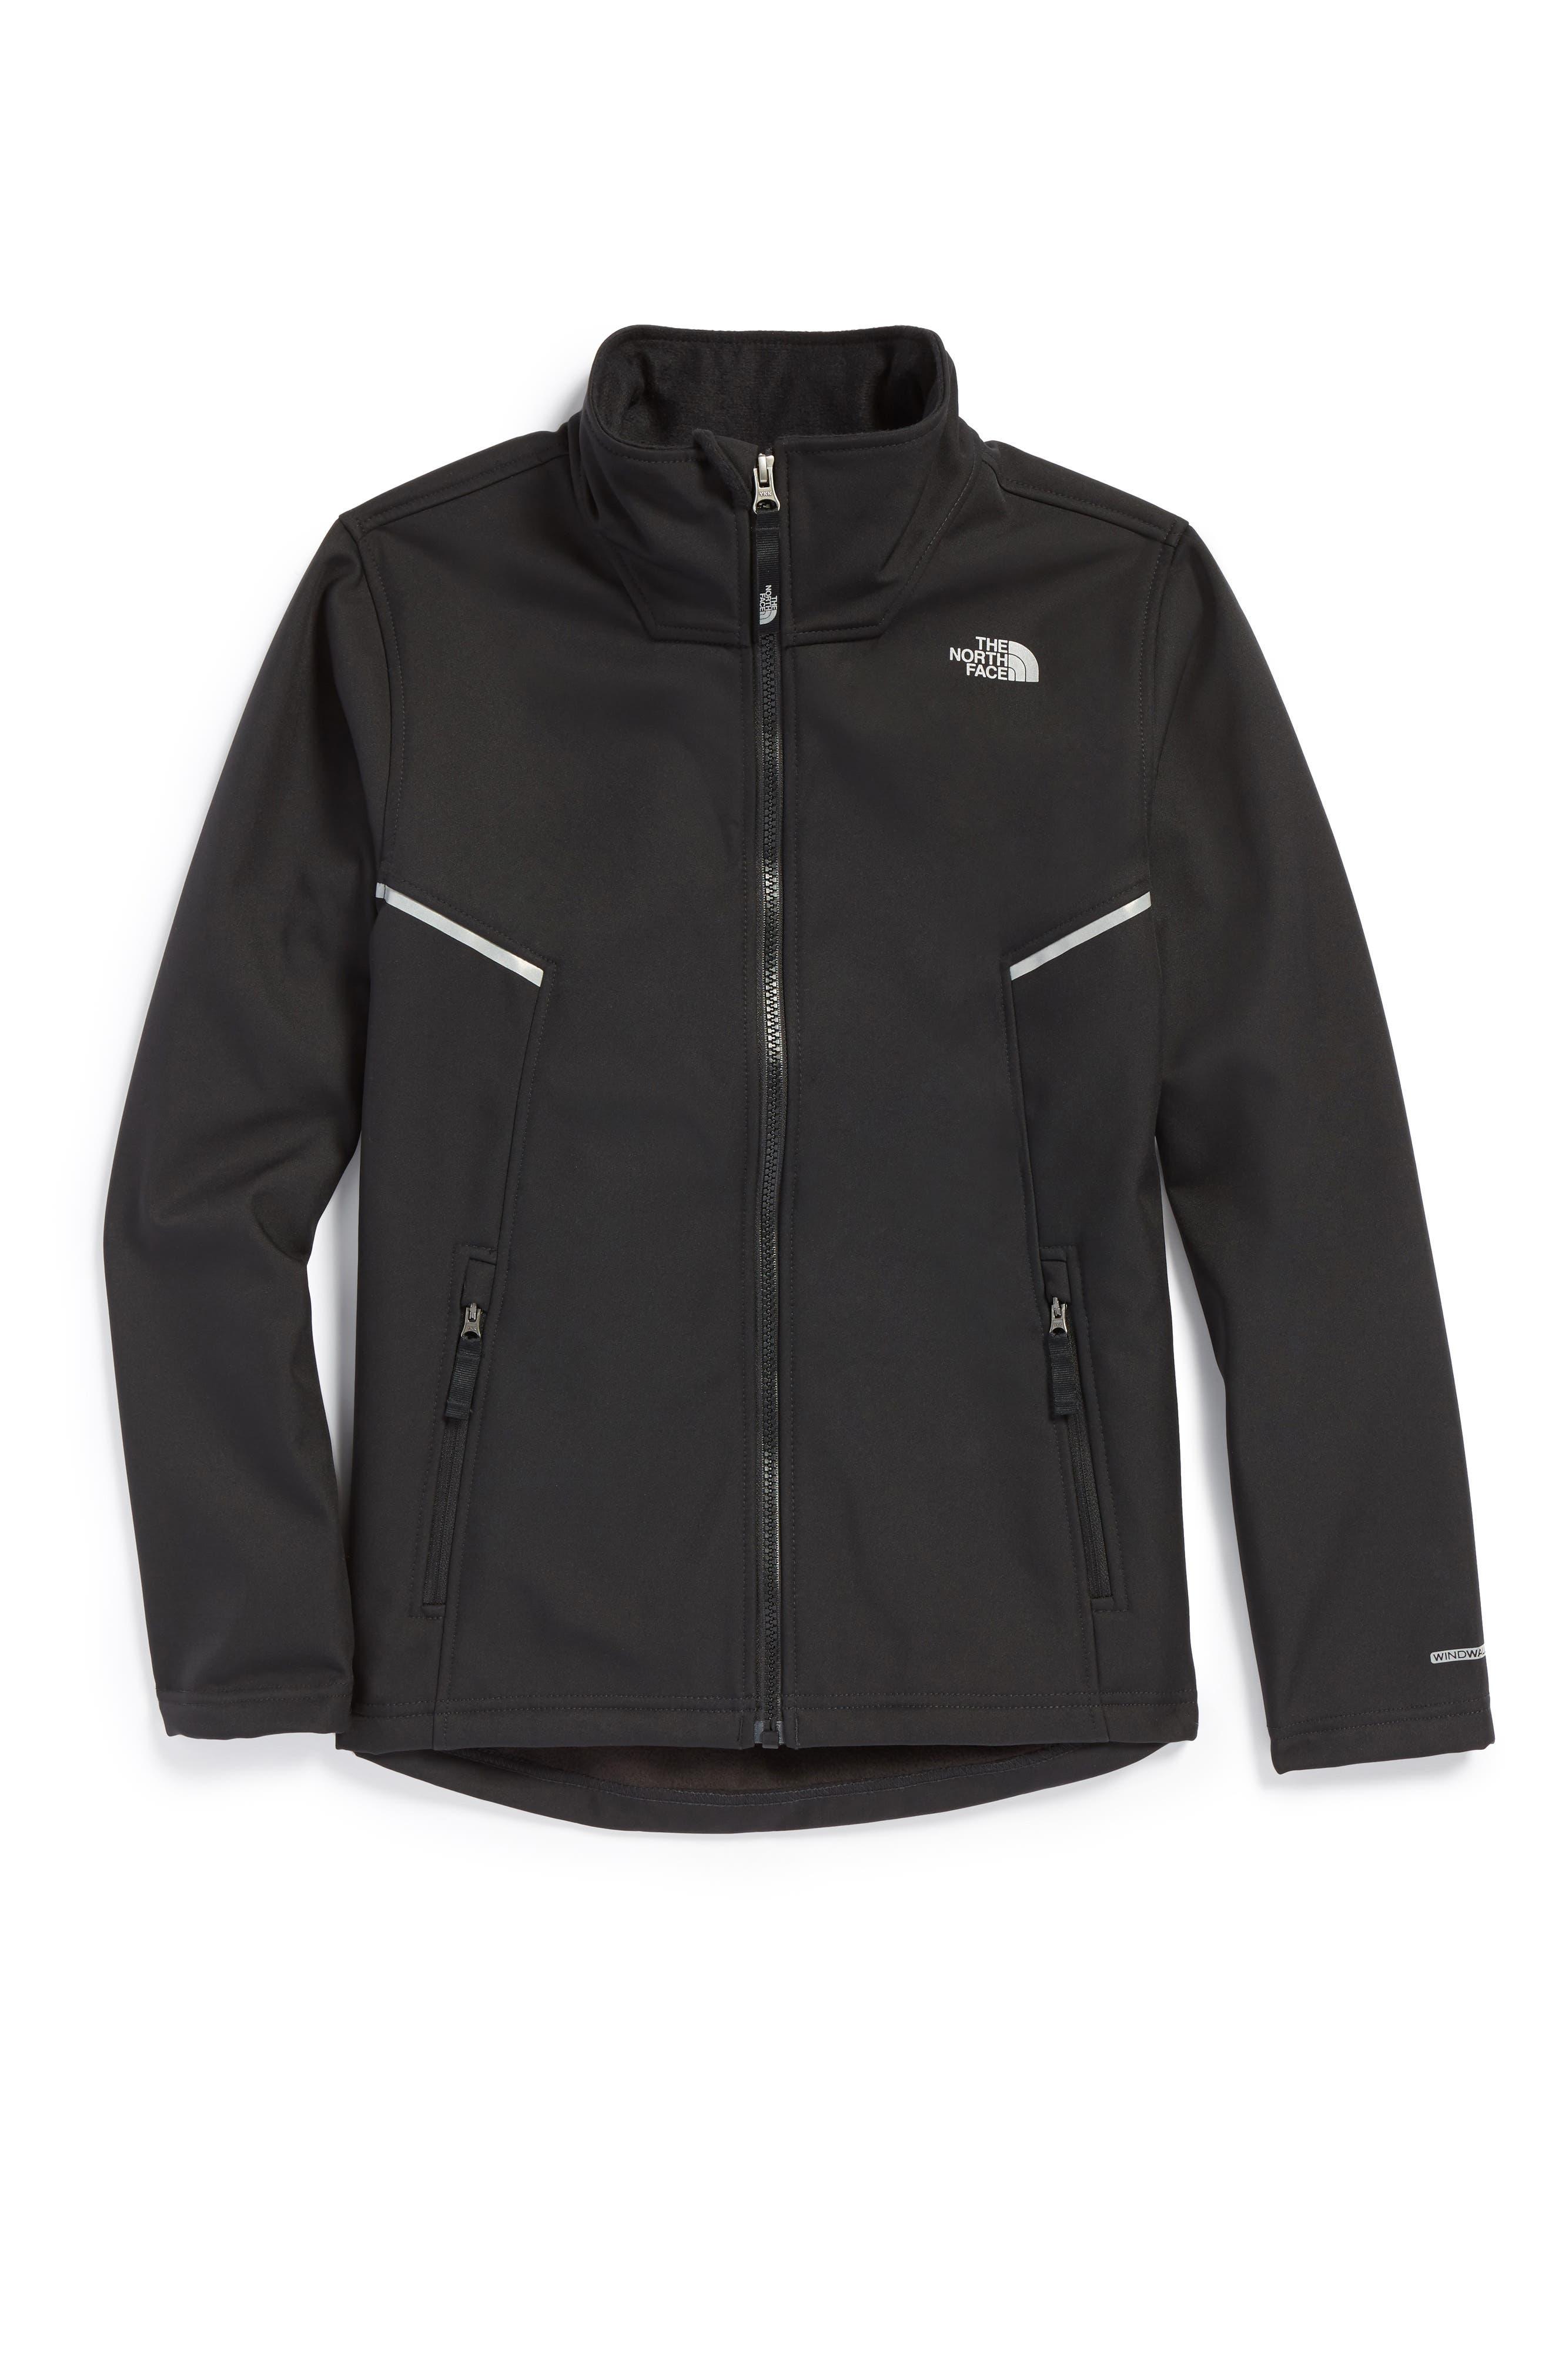 Apex Bionic Water Repellent Jacket,                         Main,                         color, Tnf Black